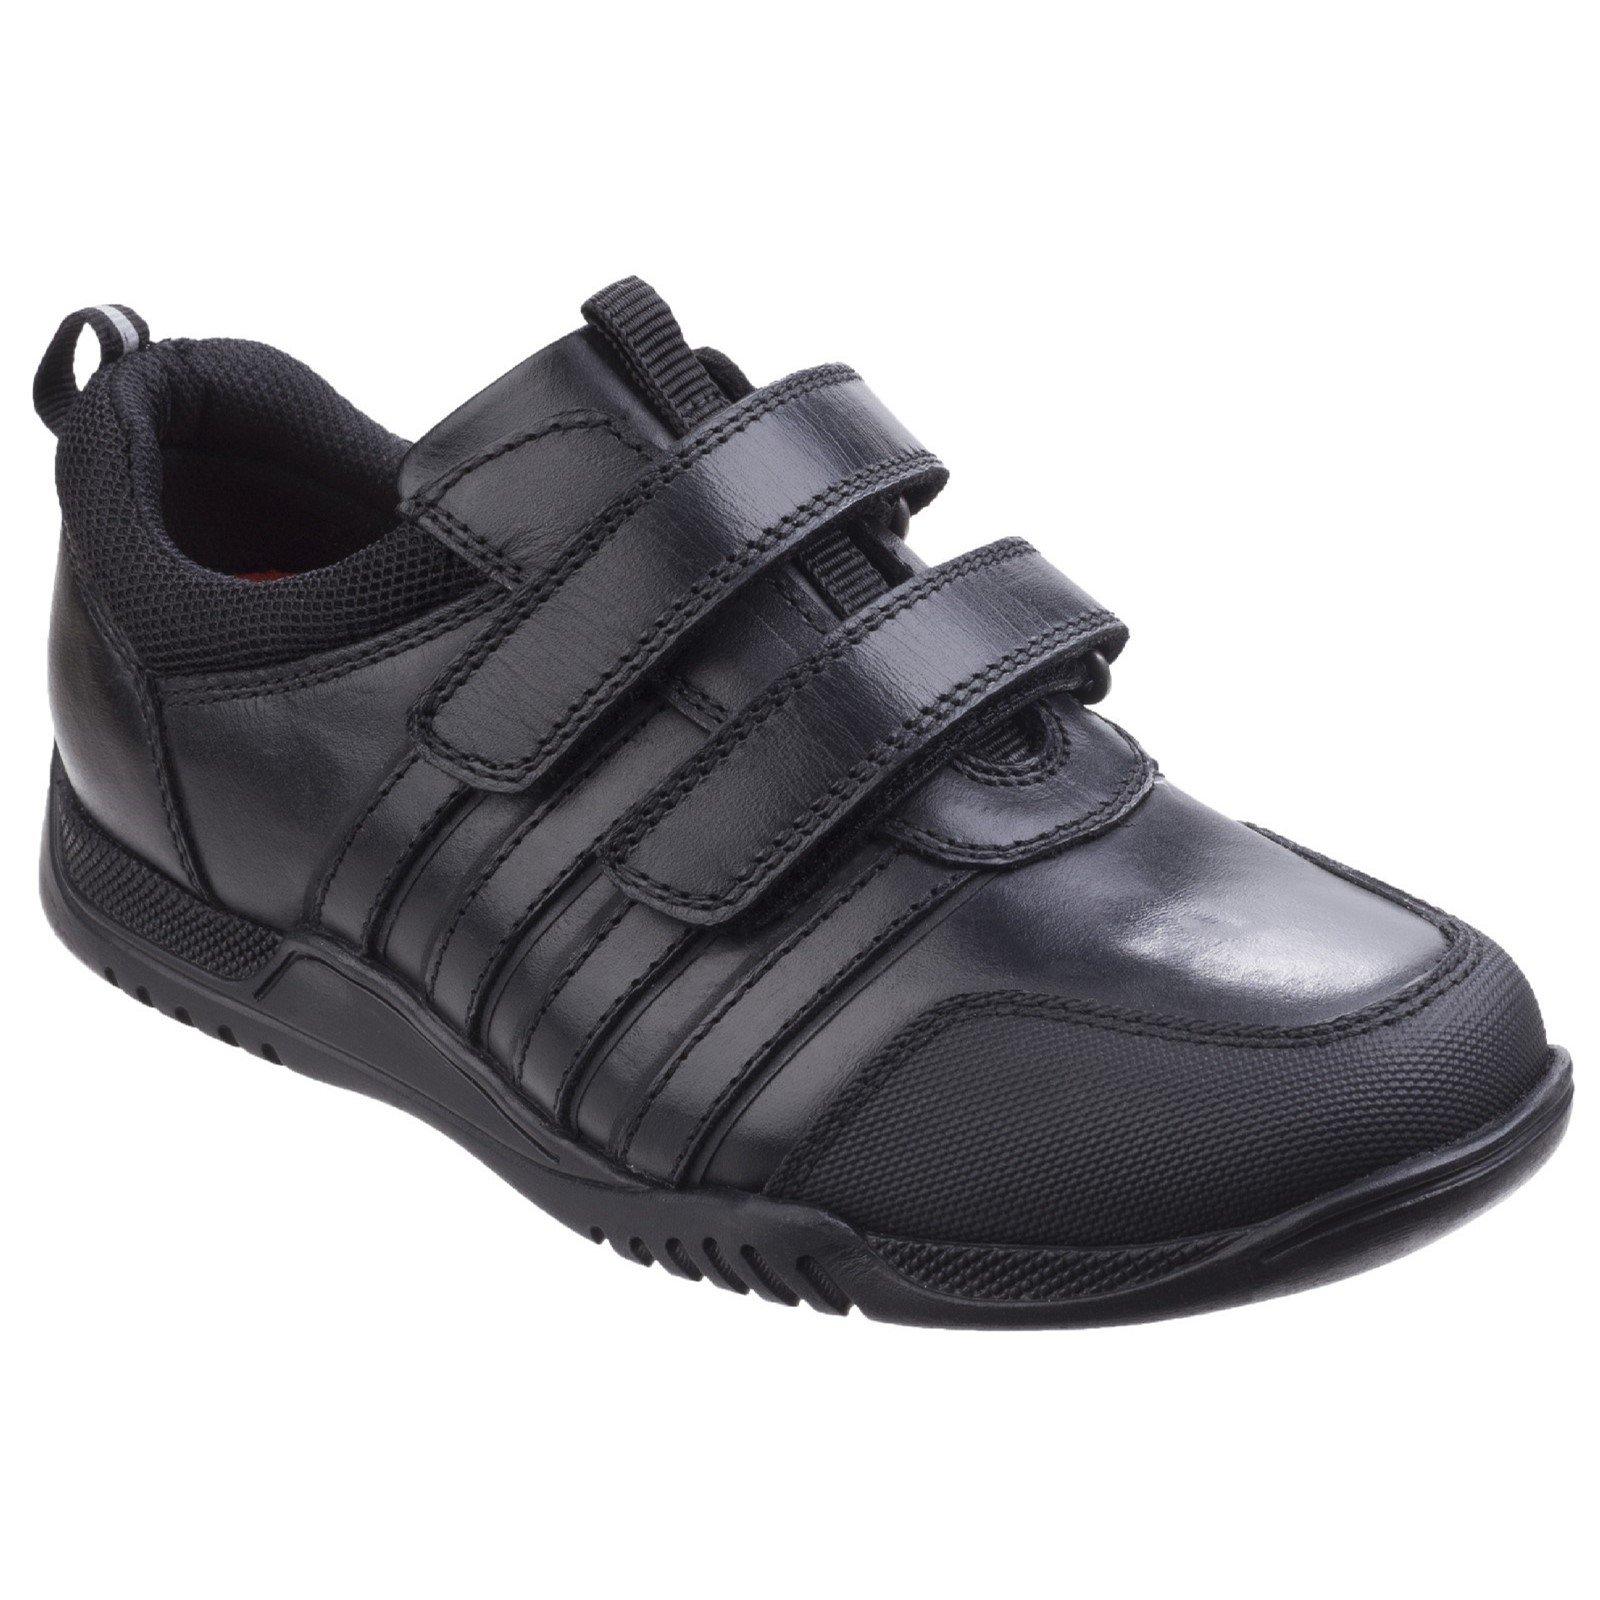 Hush Puppies Kid's Josh Senior School Shoe Black 26396 - Black 4.5